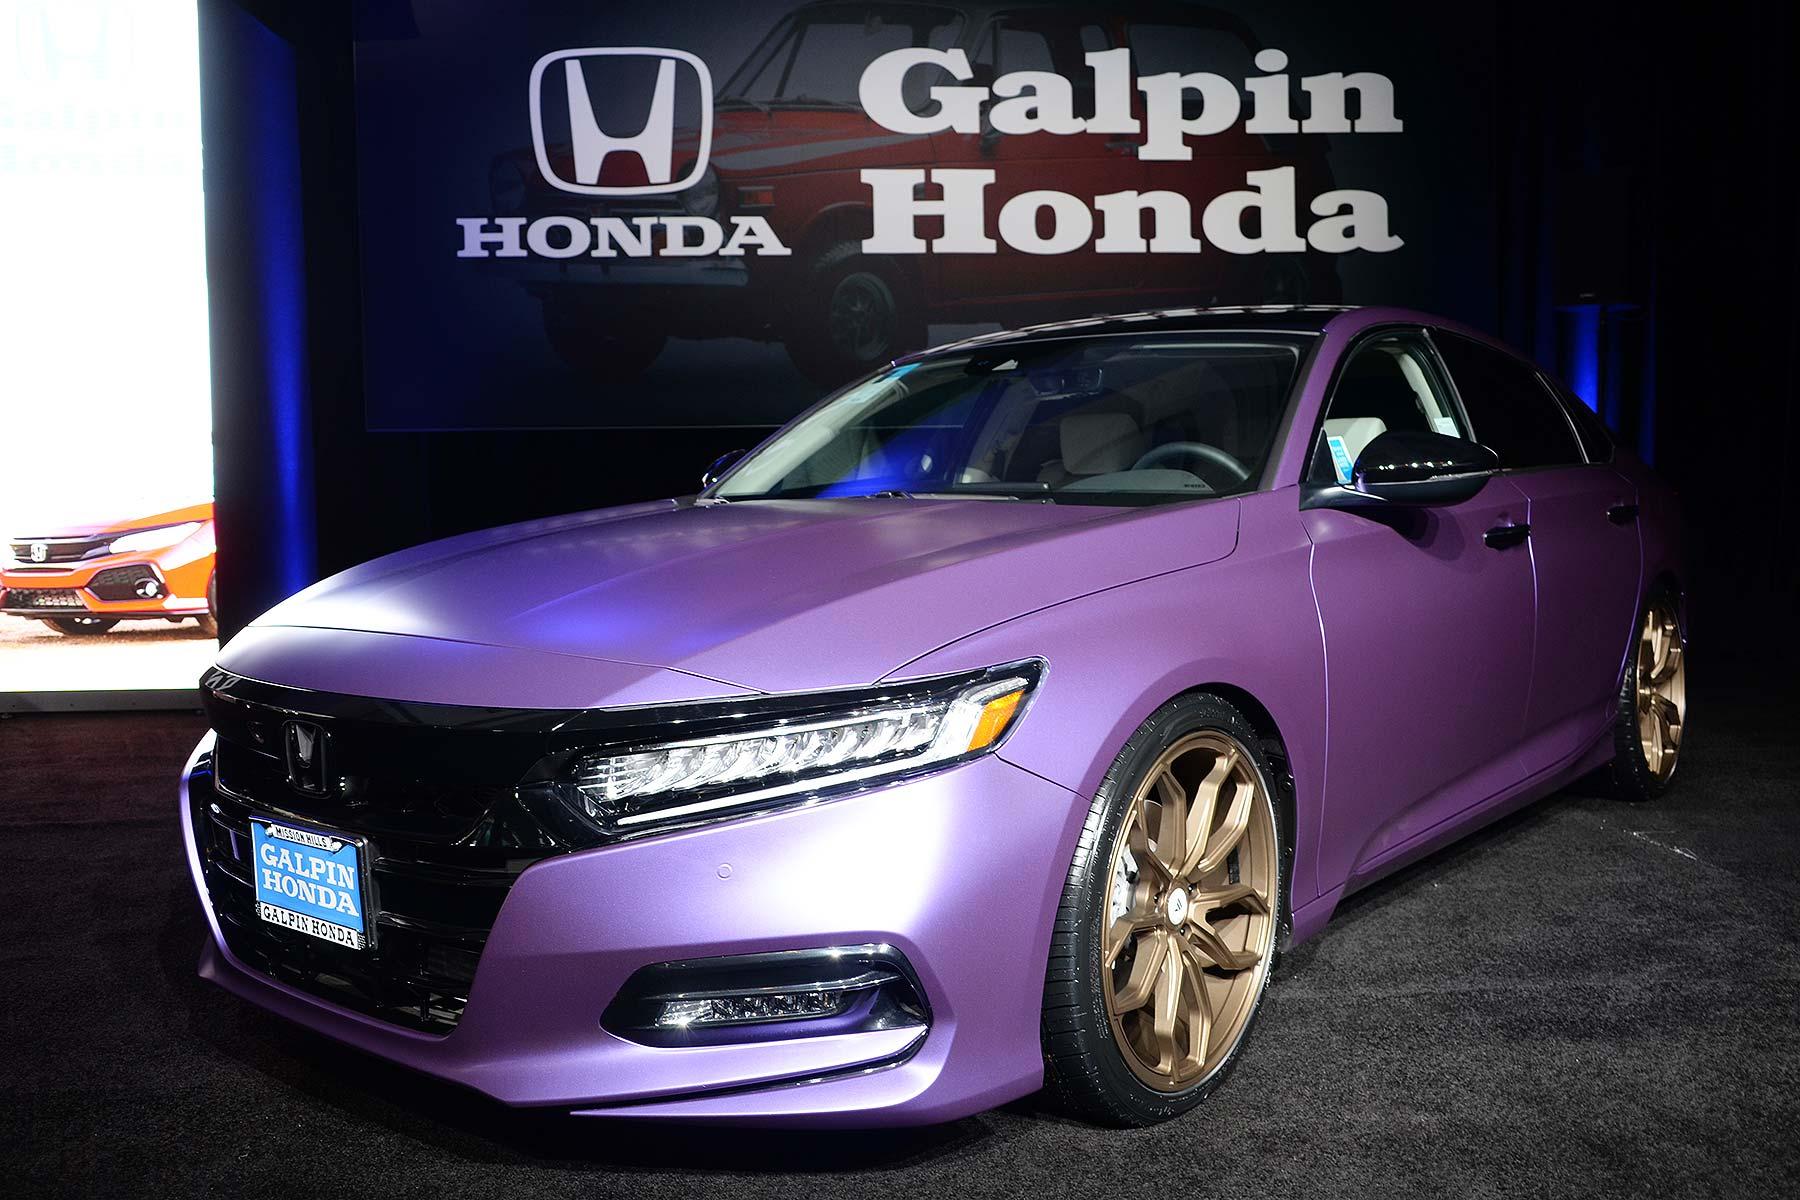 Galpin Honda Accord